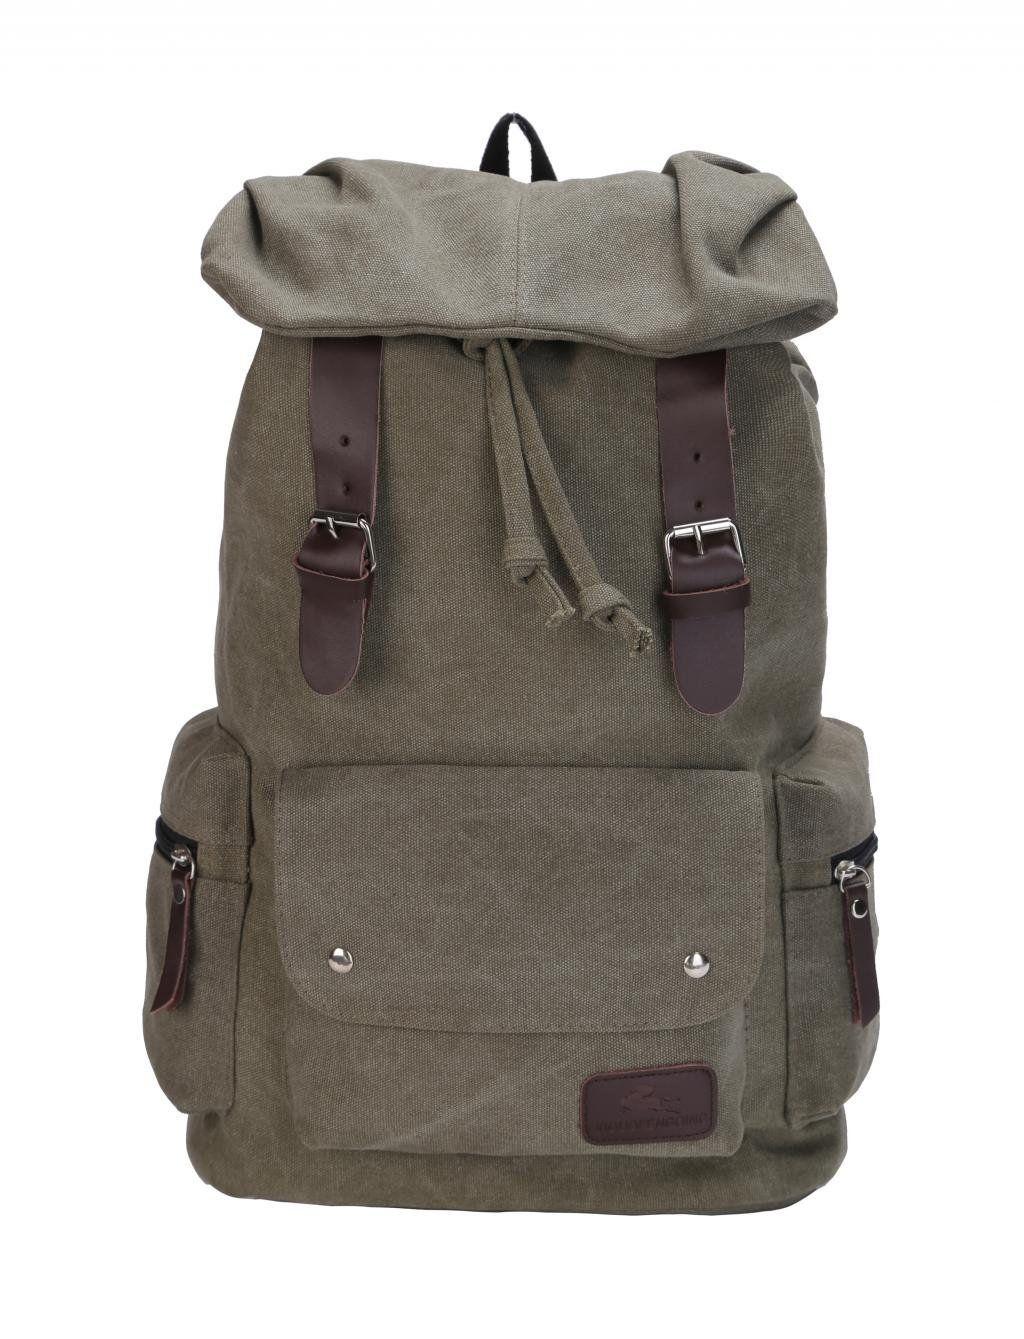 Amazon.com: VOCHIC Korean Style Canvas School Backpack Rucksack Shoulder Laptop Bag, Gift Idea: Electronics